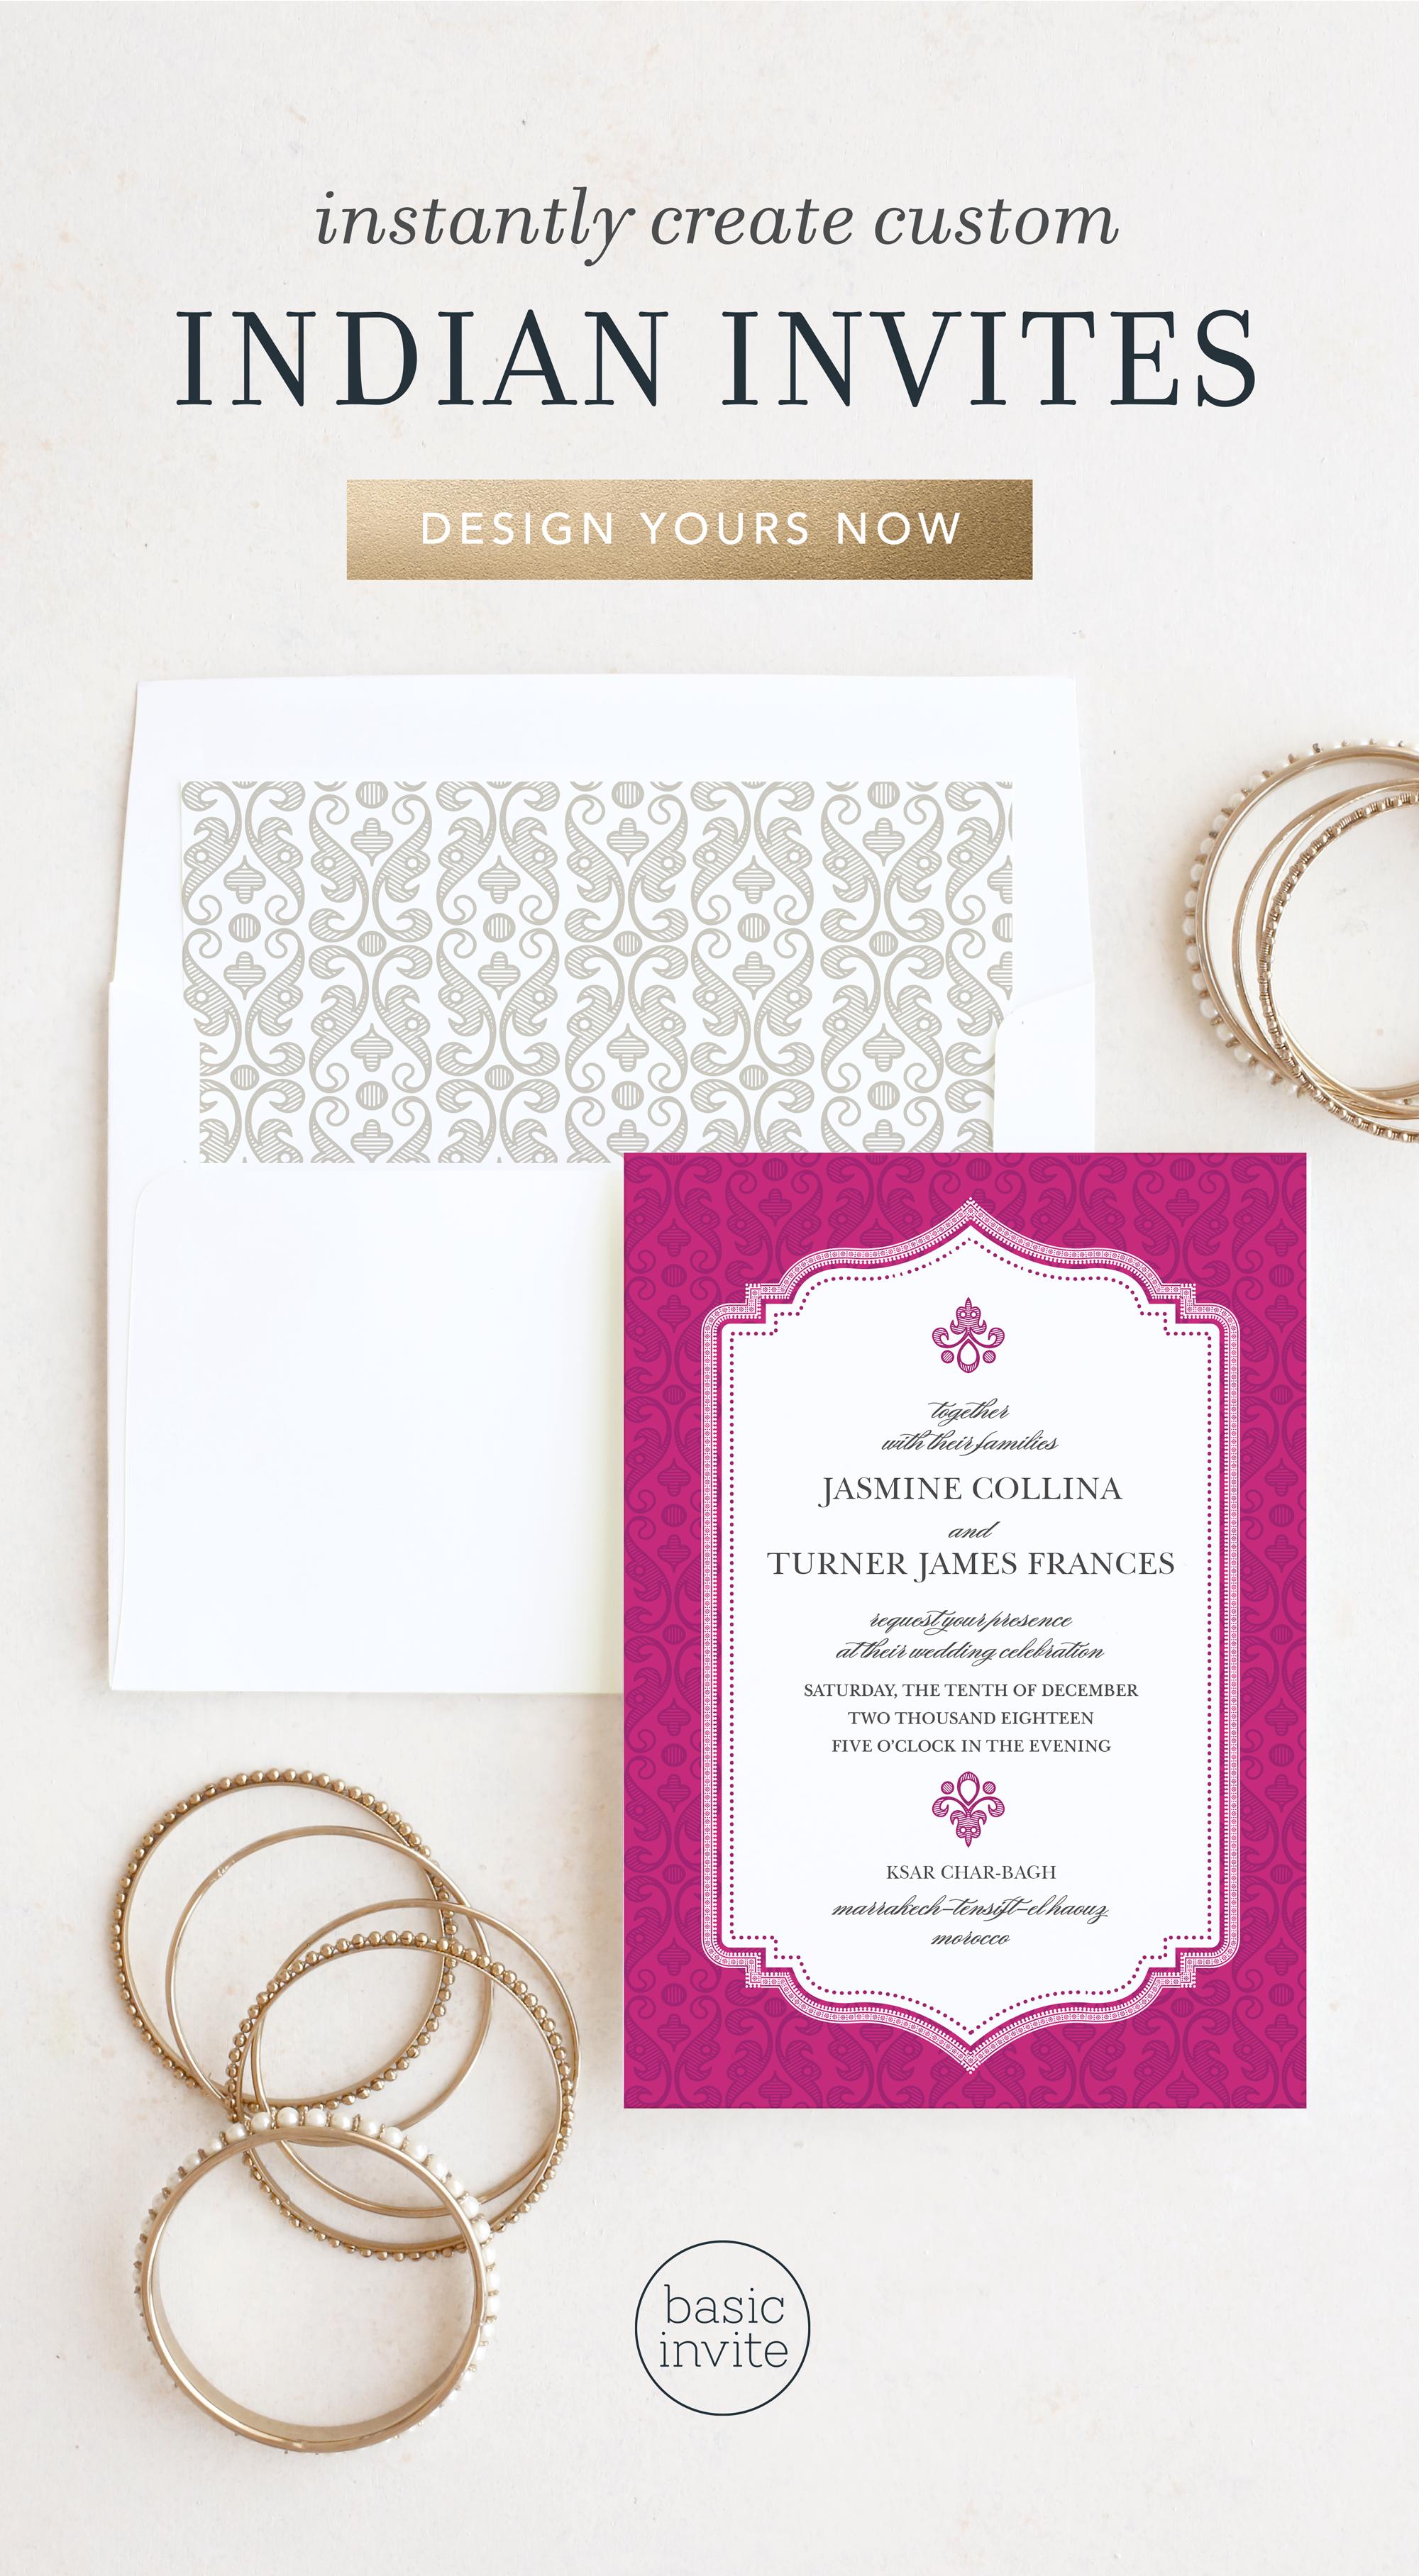 Indian Wedding Invitations in 2020 Indian wedding